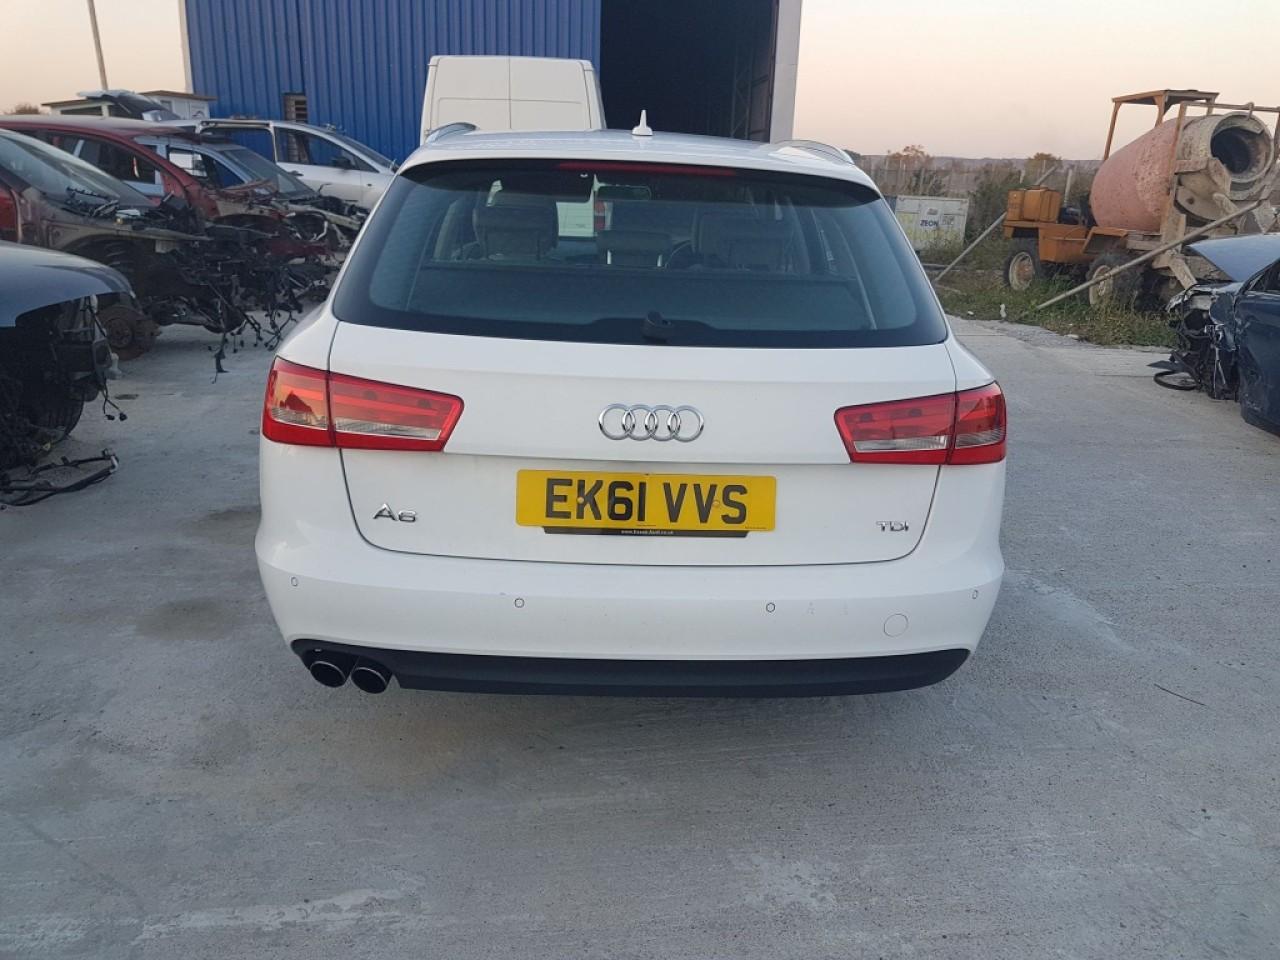 Etrier frana dreapta spate Audi A6 4G C7 2012 variant 2.0 tdi